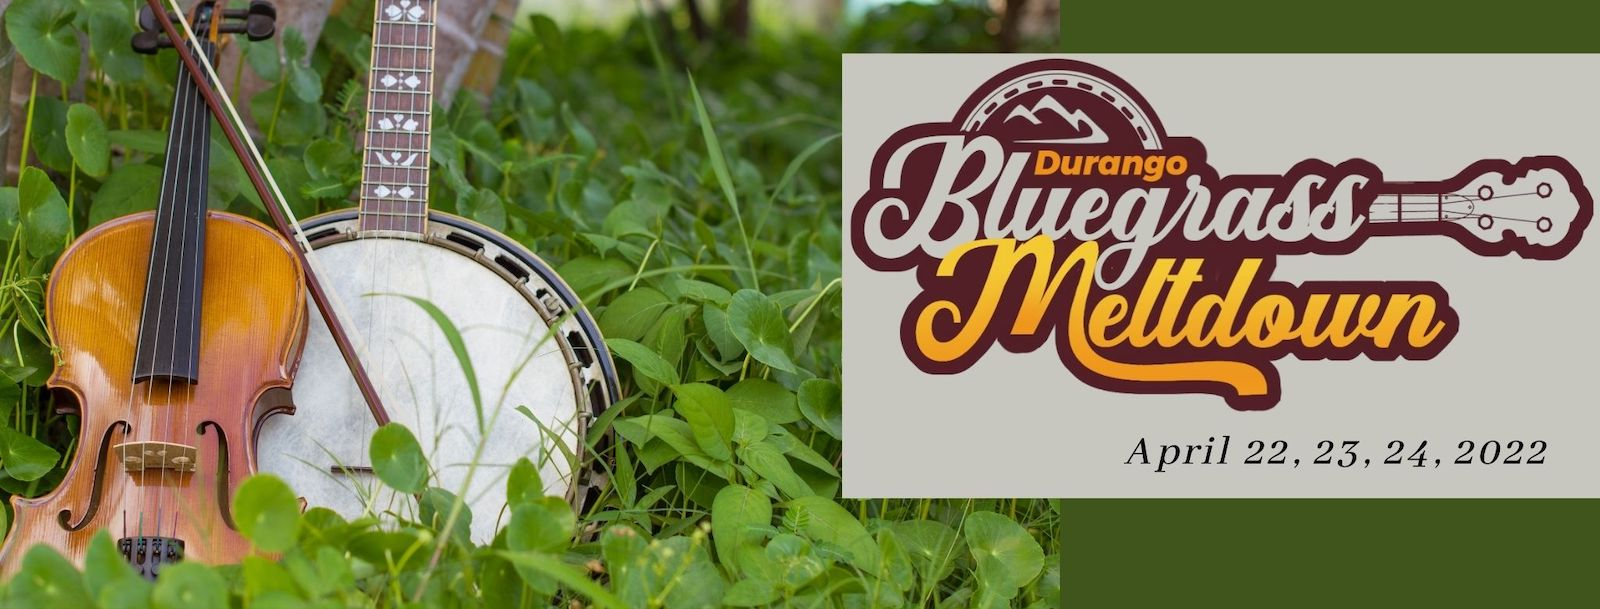 Image of the Durango Bluegrass Meltdown flyer in Colorado